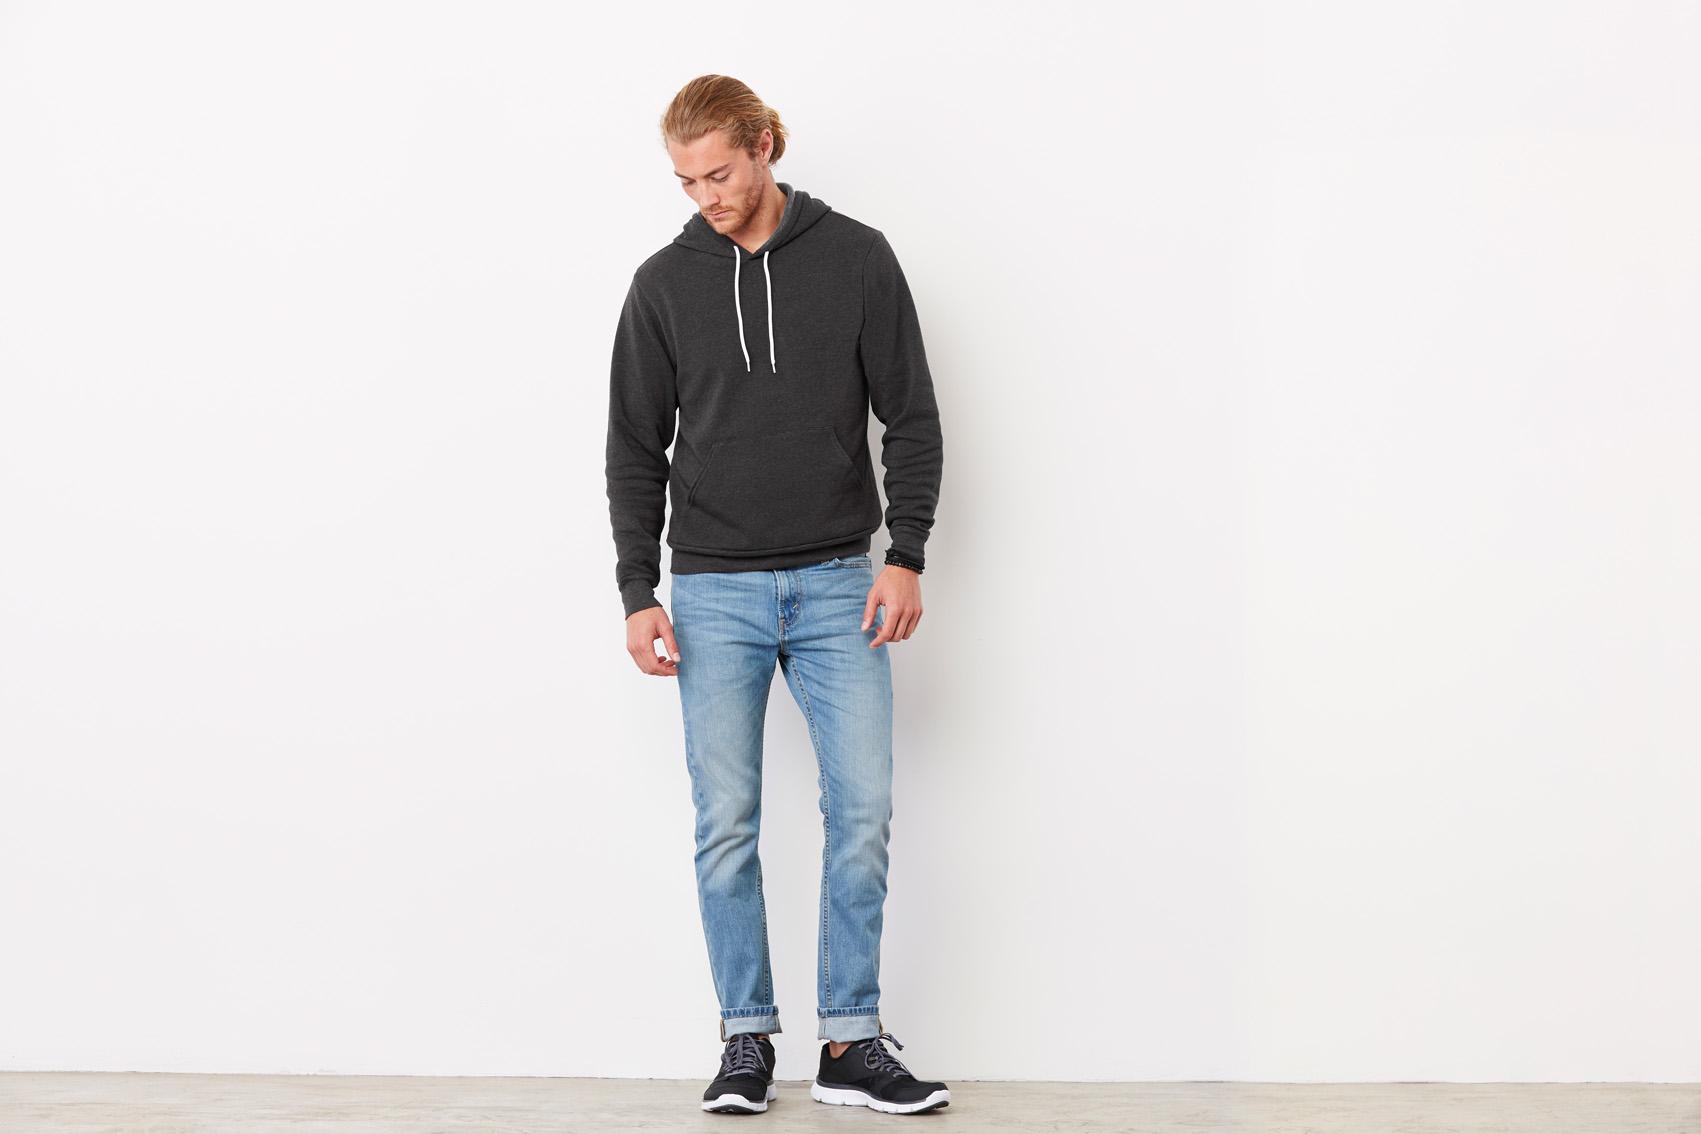 Bel+Can Sweater Hood Unisex